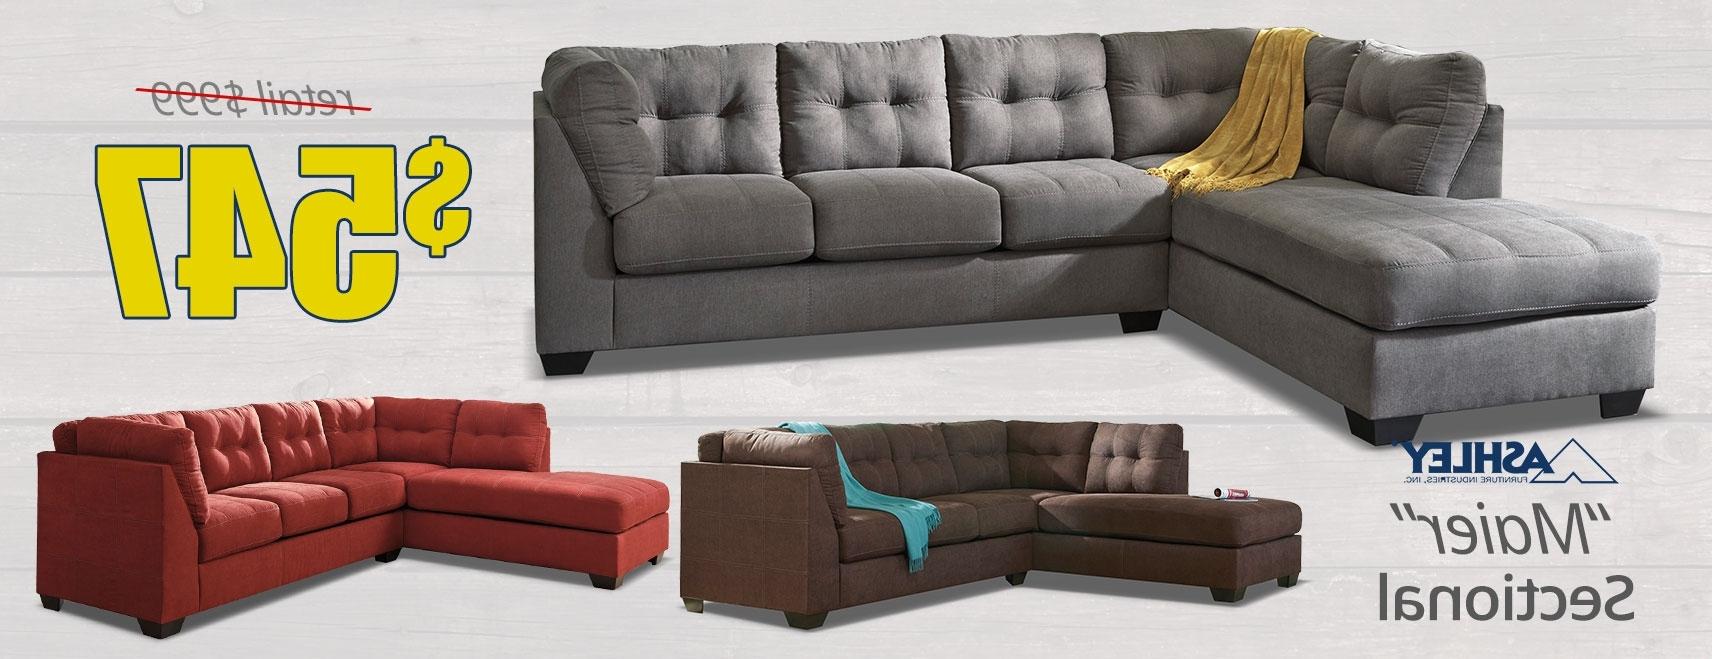 Ohio's #1 Furniture & Mattress Store Regarding Cincinnati Sectional Sofas (View 16 of 20)